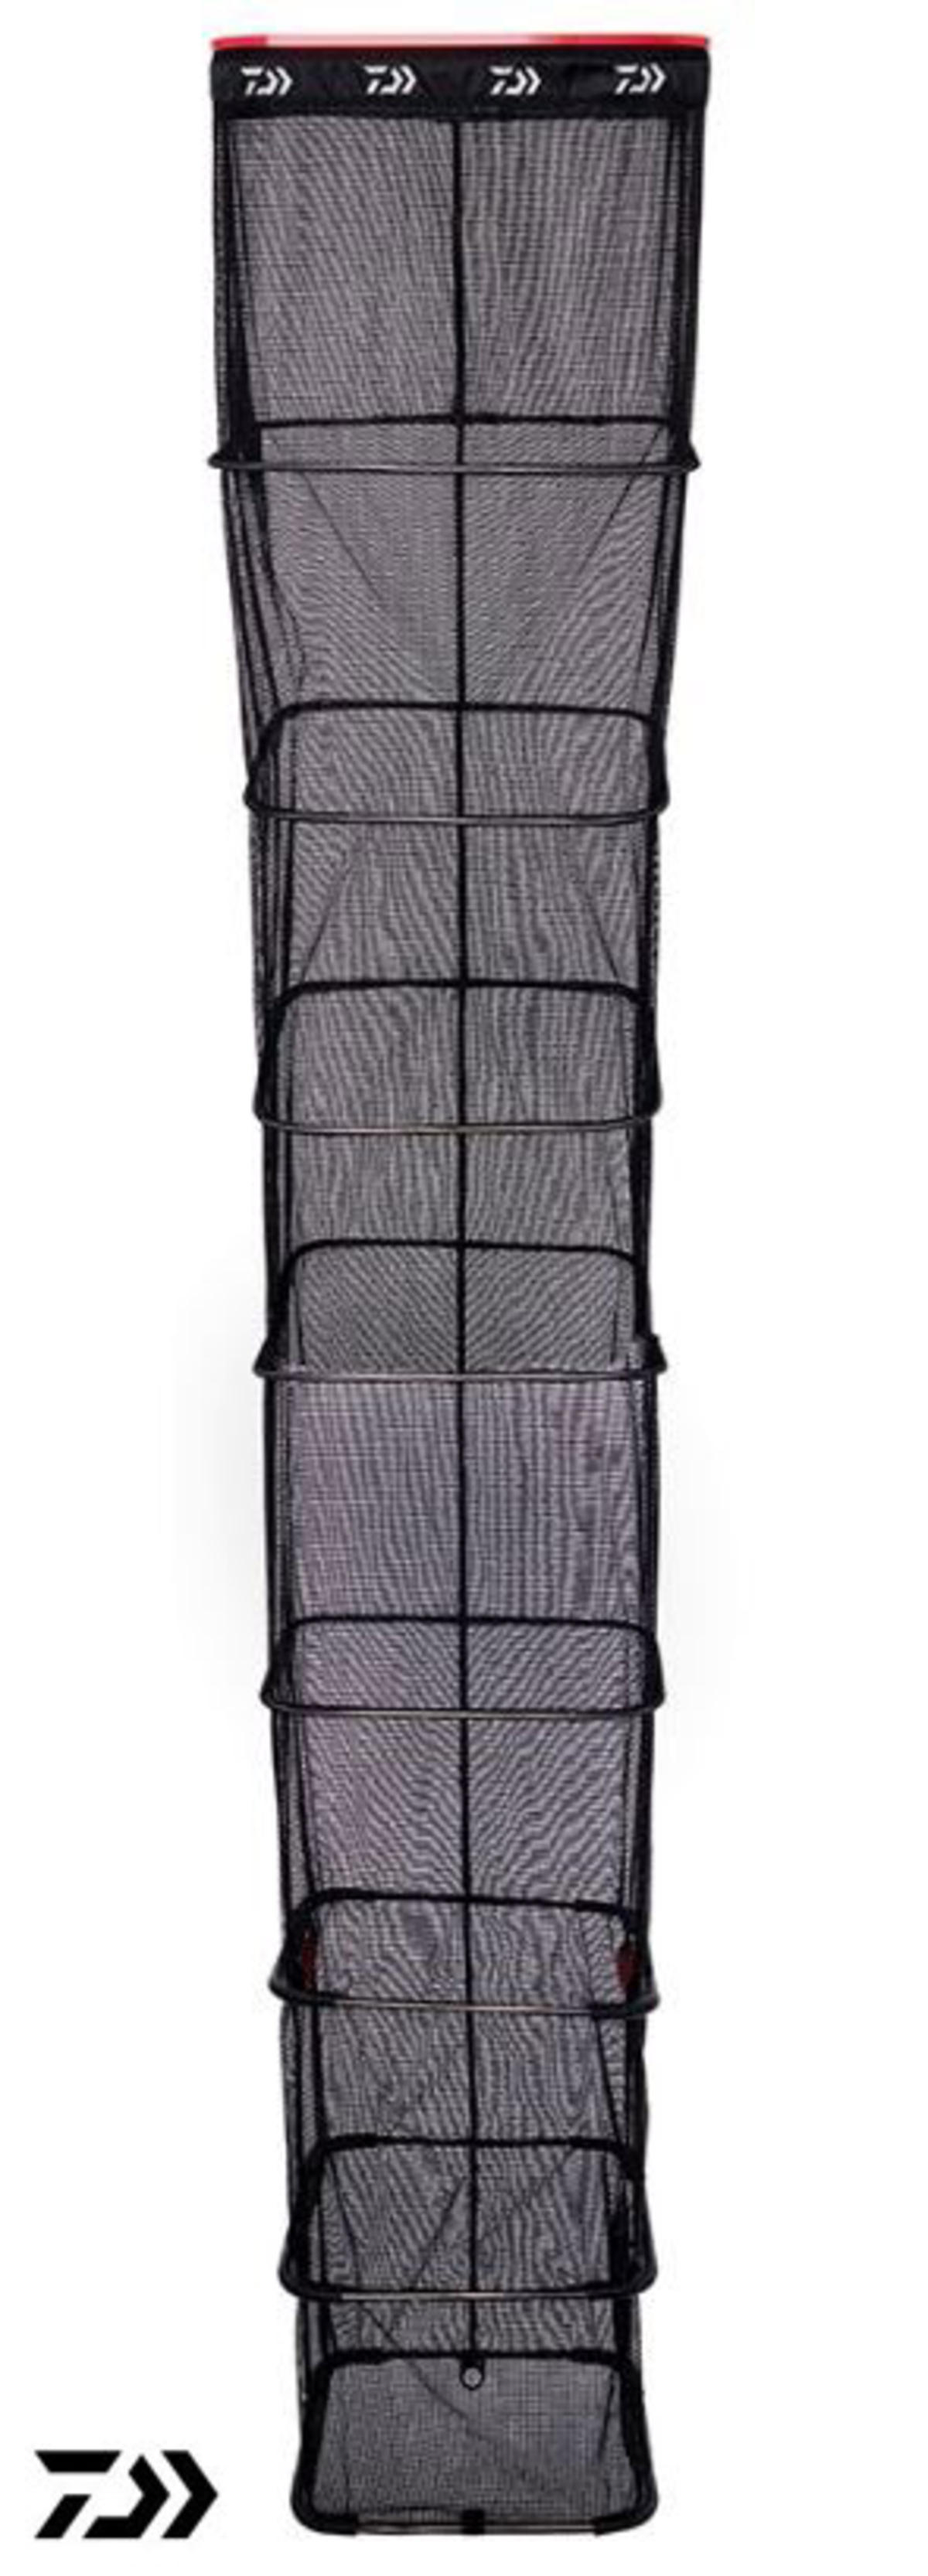 New Daiwa Tournament Commercial Carp Keepnets - 2.5m / 3m - All Models